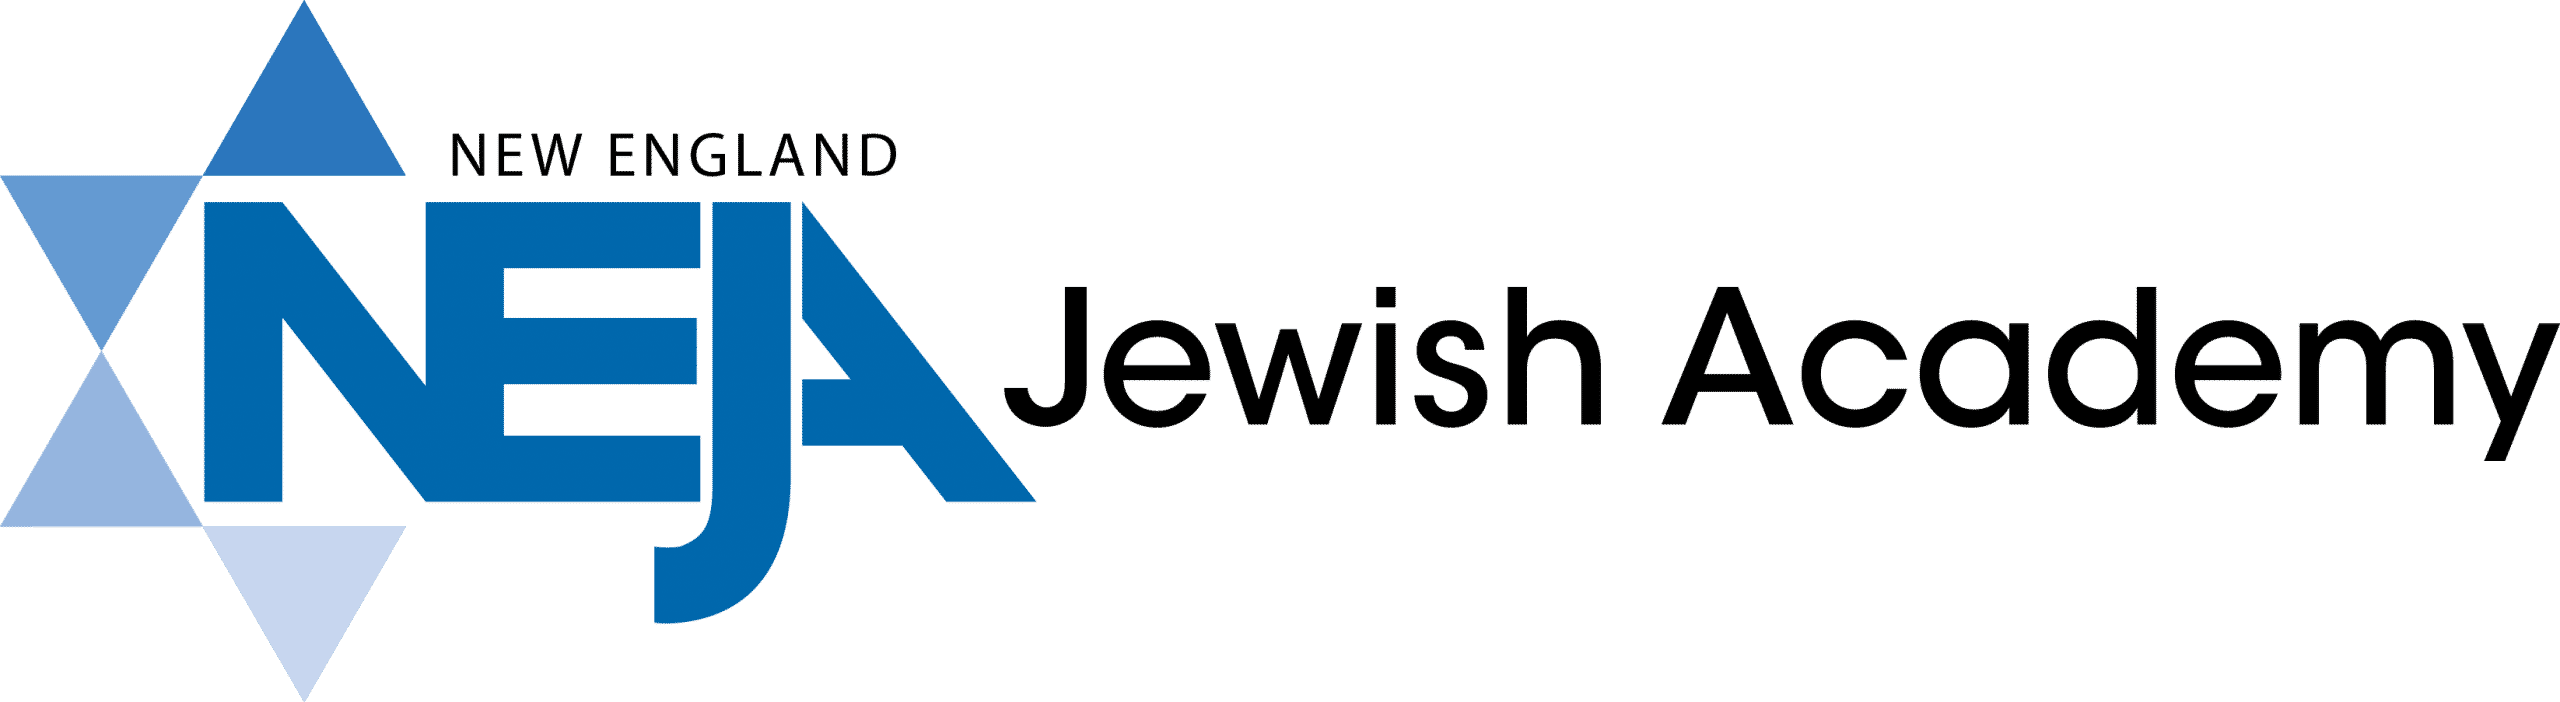 New England Jewish Academy